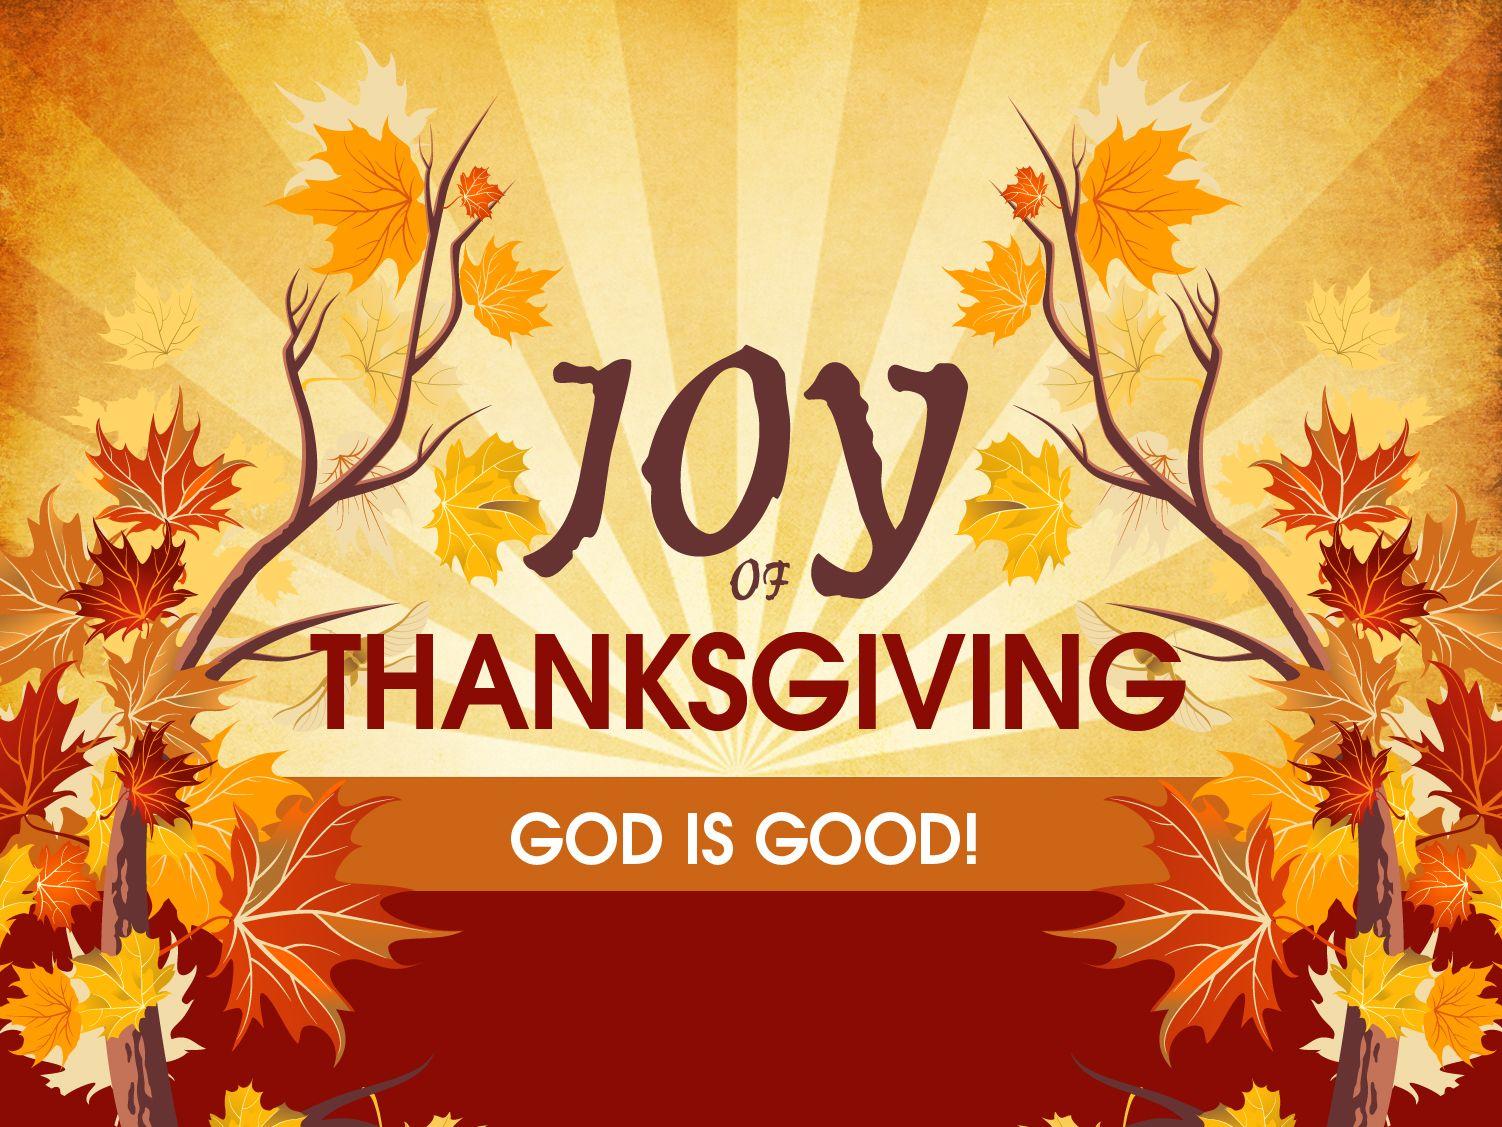 Thanksgiving autumn pinterest thanksgiving and grateful heart thanksgiving thanksgiving prayersthanksgiving greetingsthanksgiving dinnersgrateful heartgod kristyandbryce Choice Image